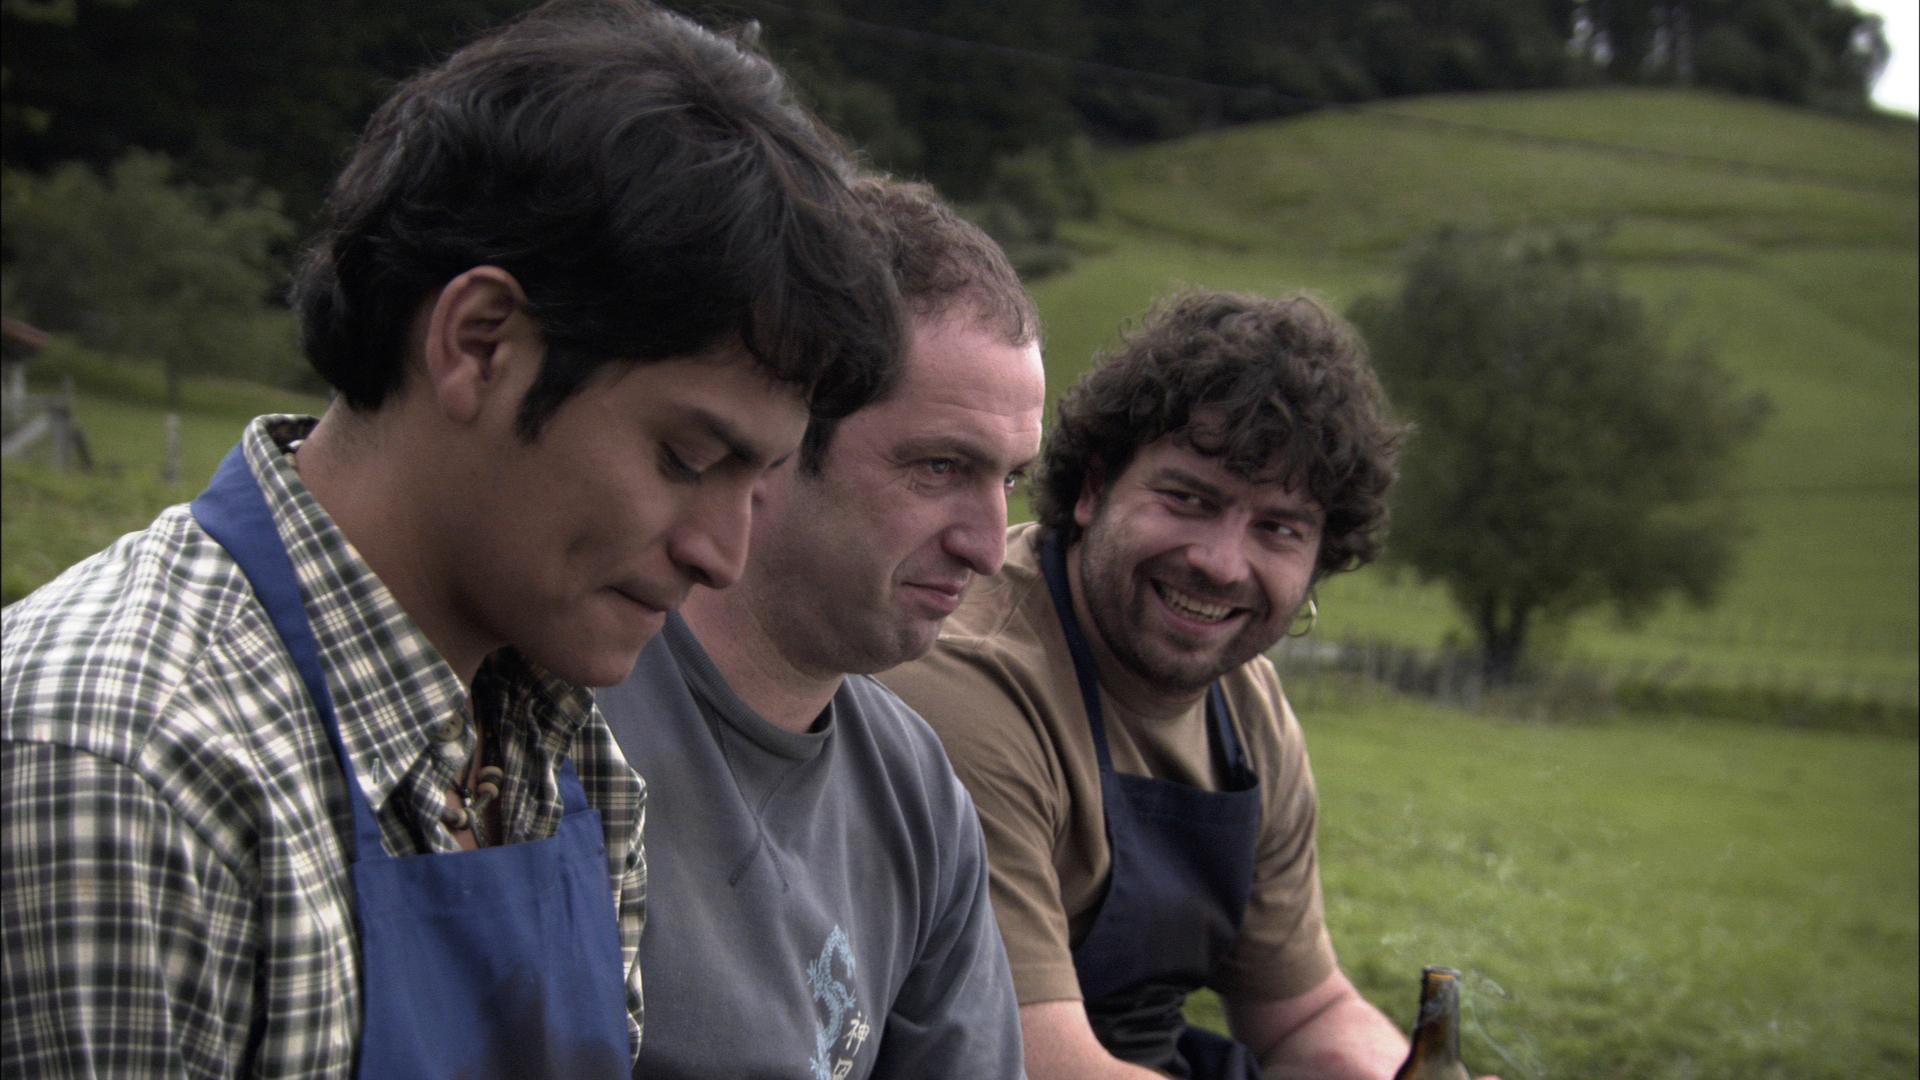 Cristhian Esquivel, Josean Bengoetxea, and Pako Revueltas in Ander (2009)